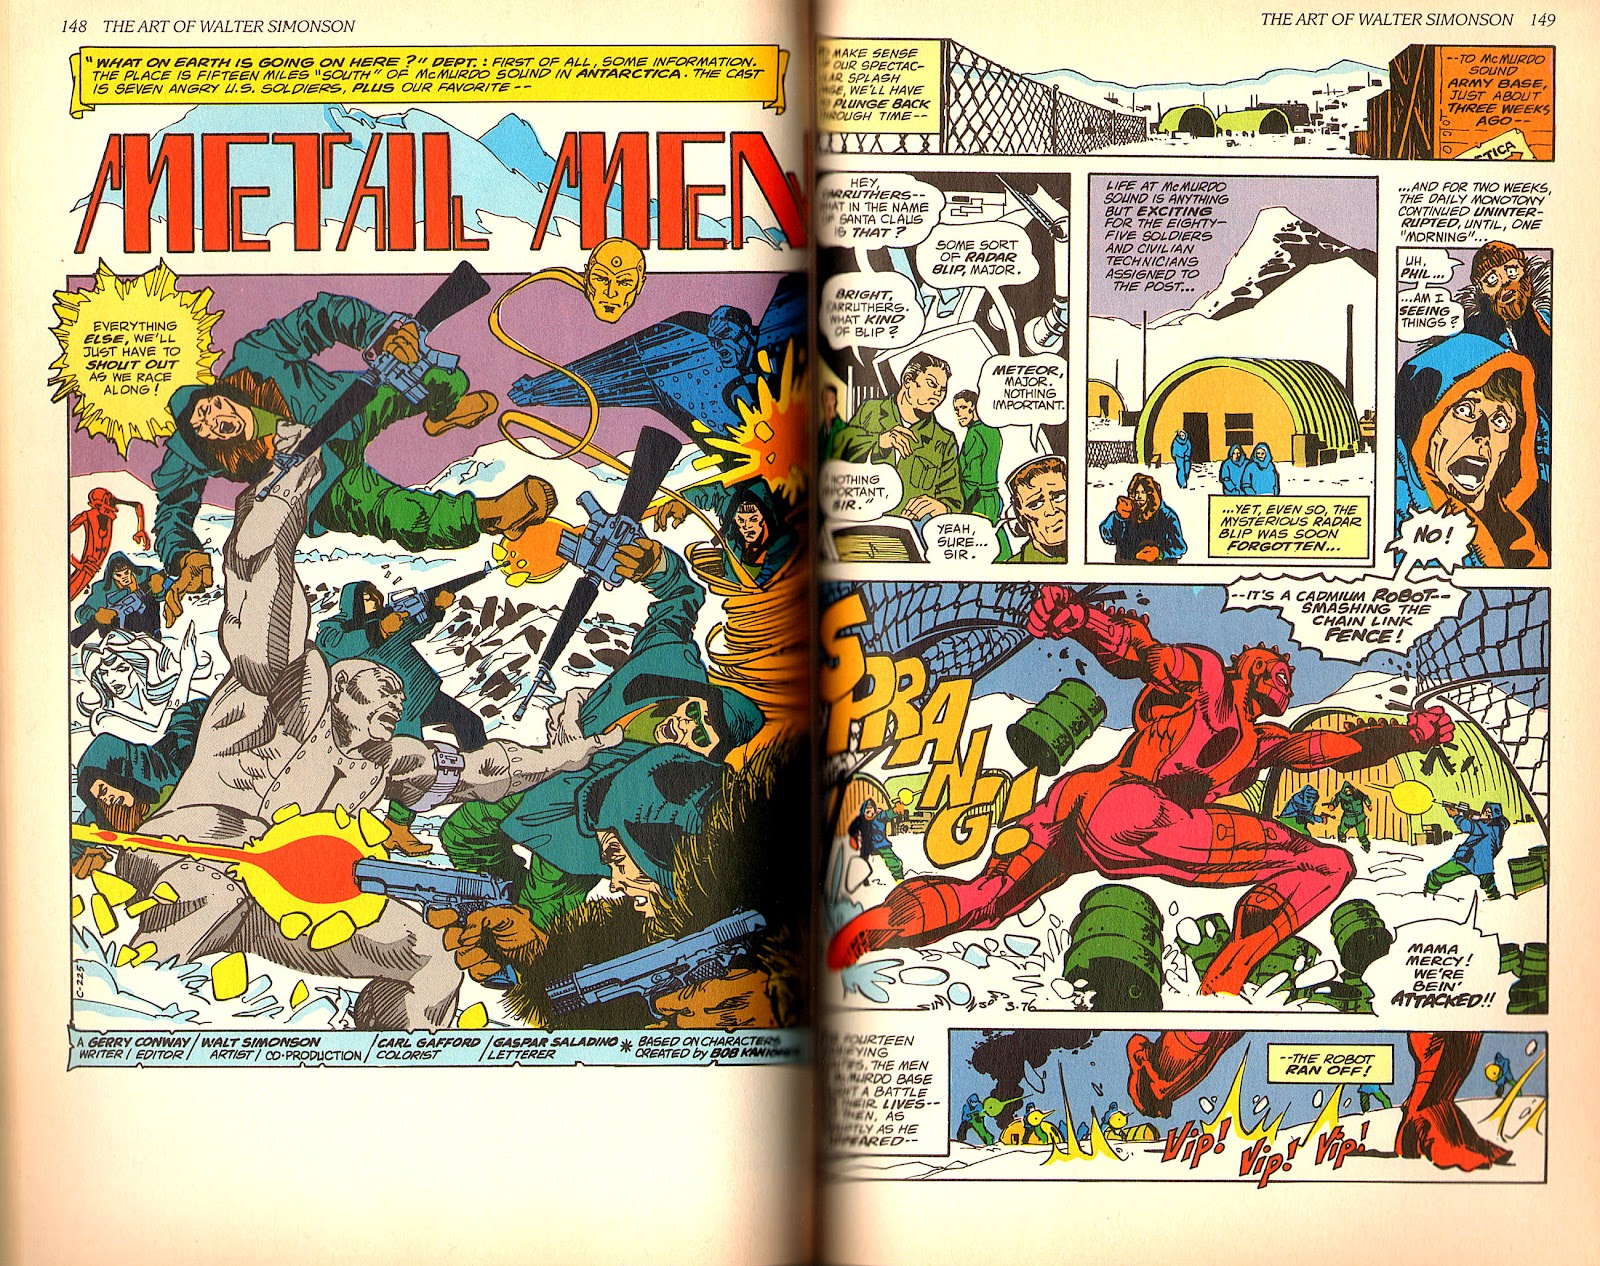 Read online The Art of Walter Simonson comic -  Issue # TPB - 76